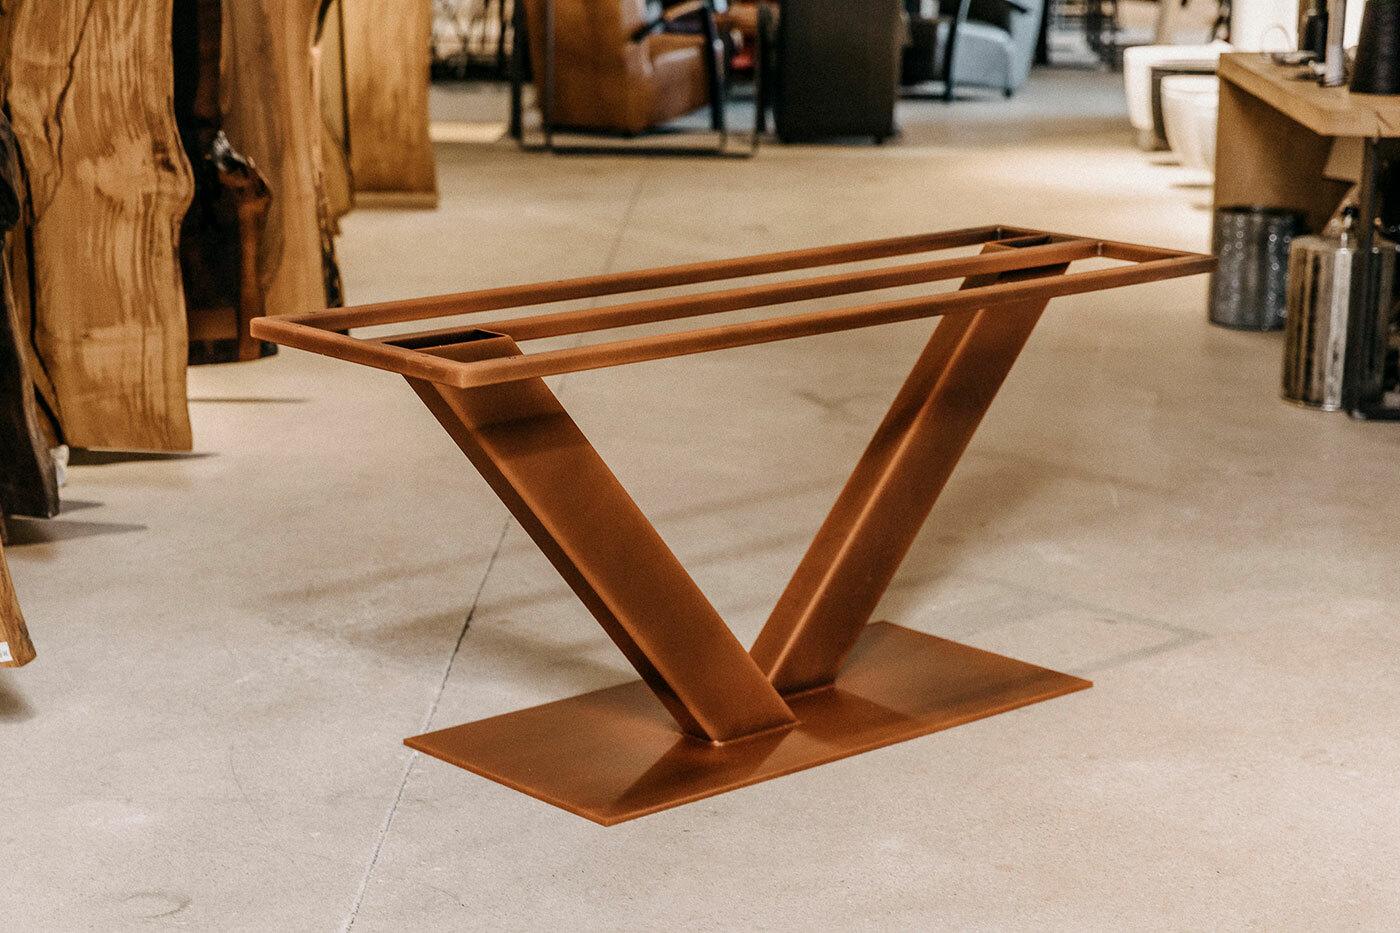 Metall Tischgestell Suka nach Maß Rost-Optik